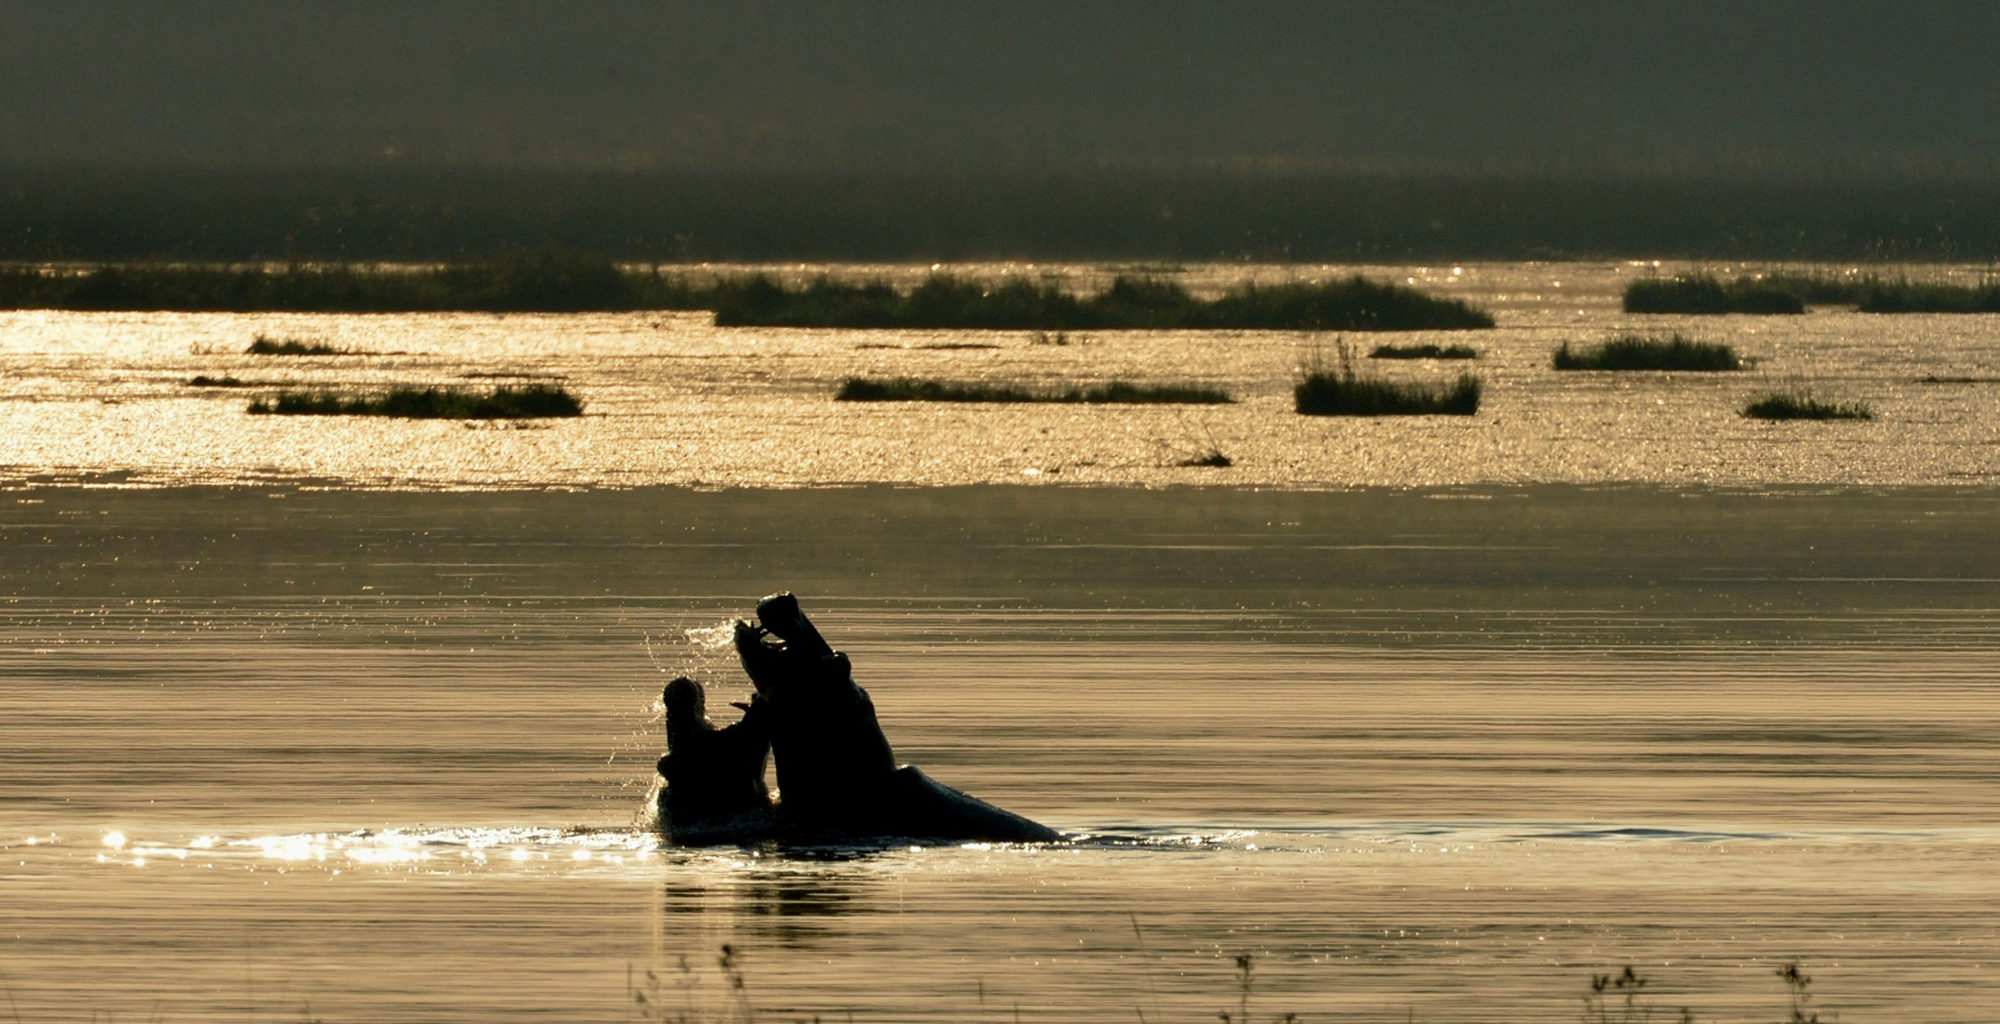 Zambia-Kasanka-National-Park-Wildlife-Hippo